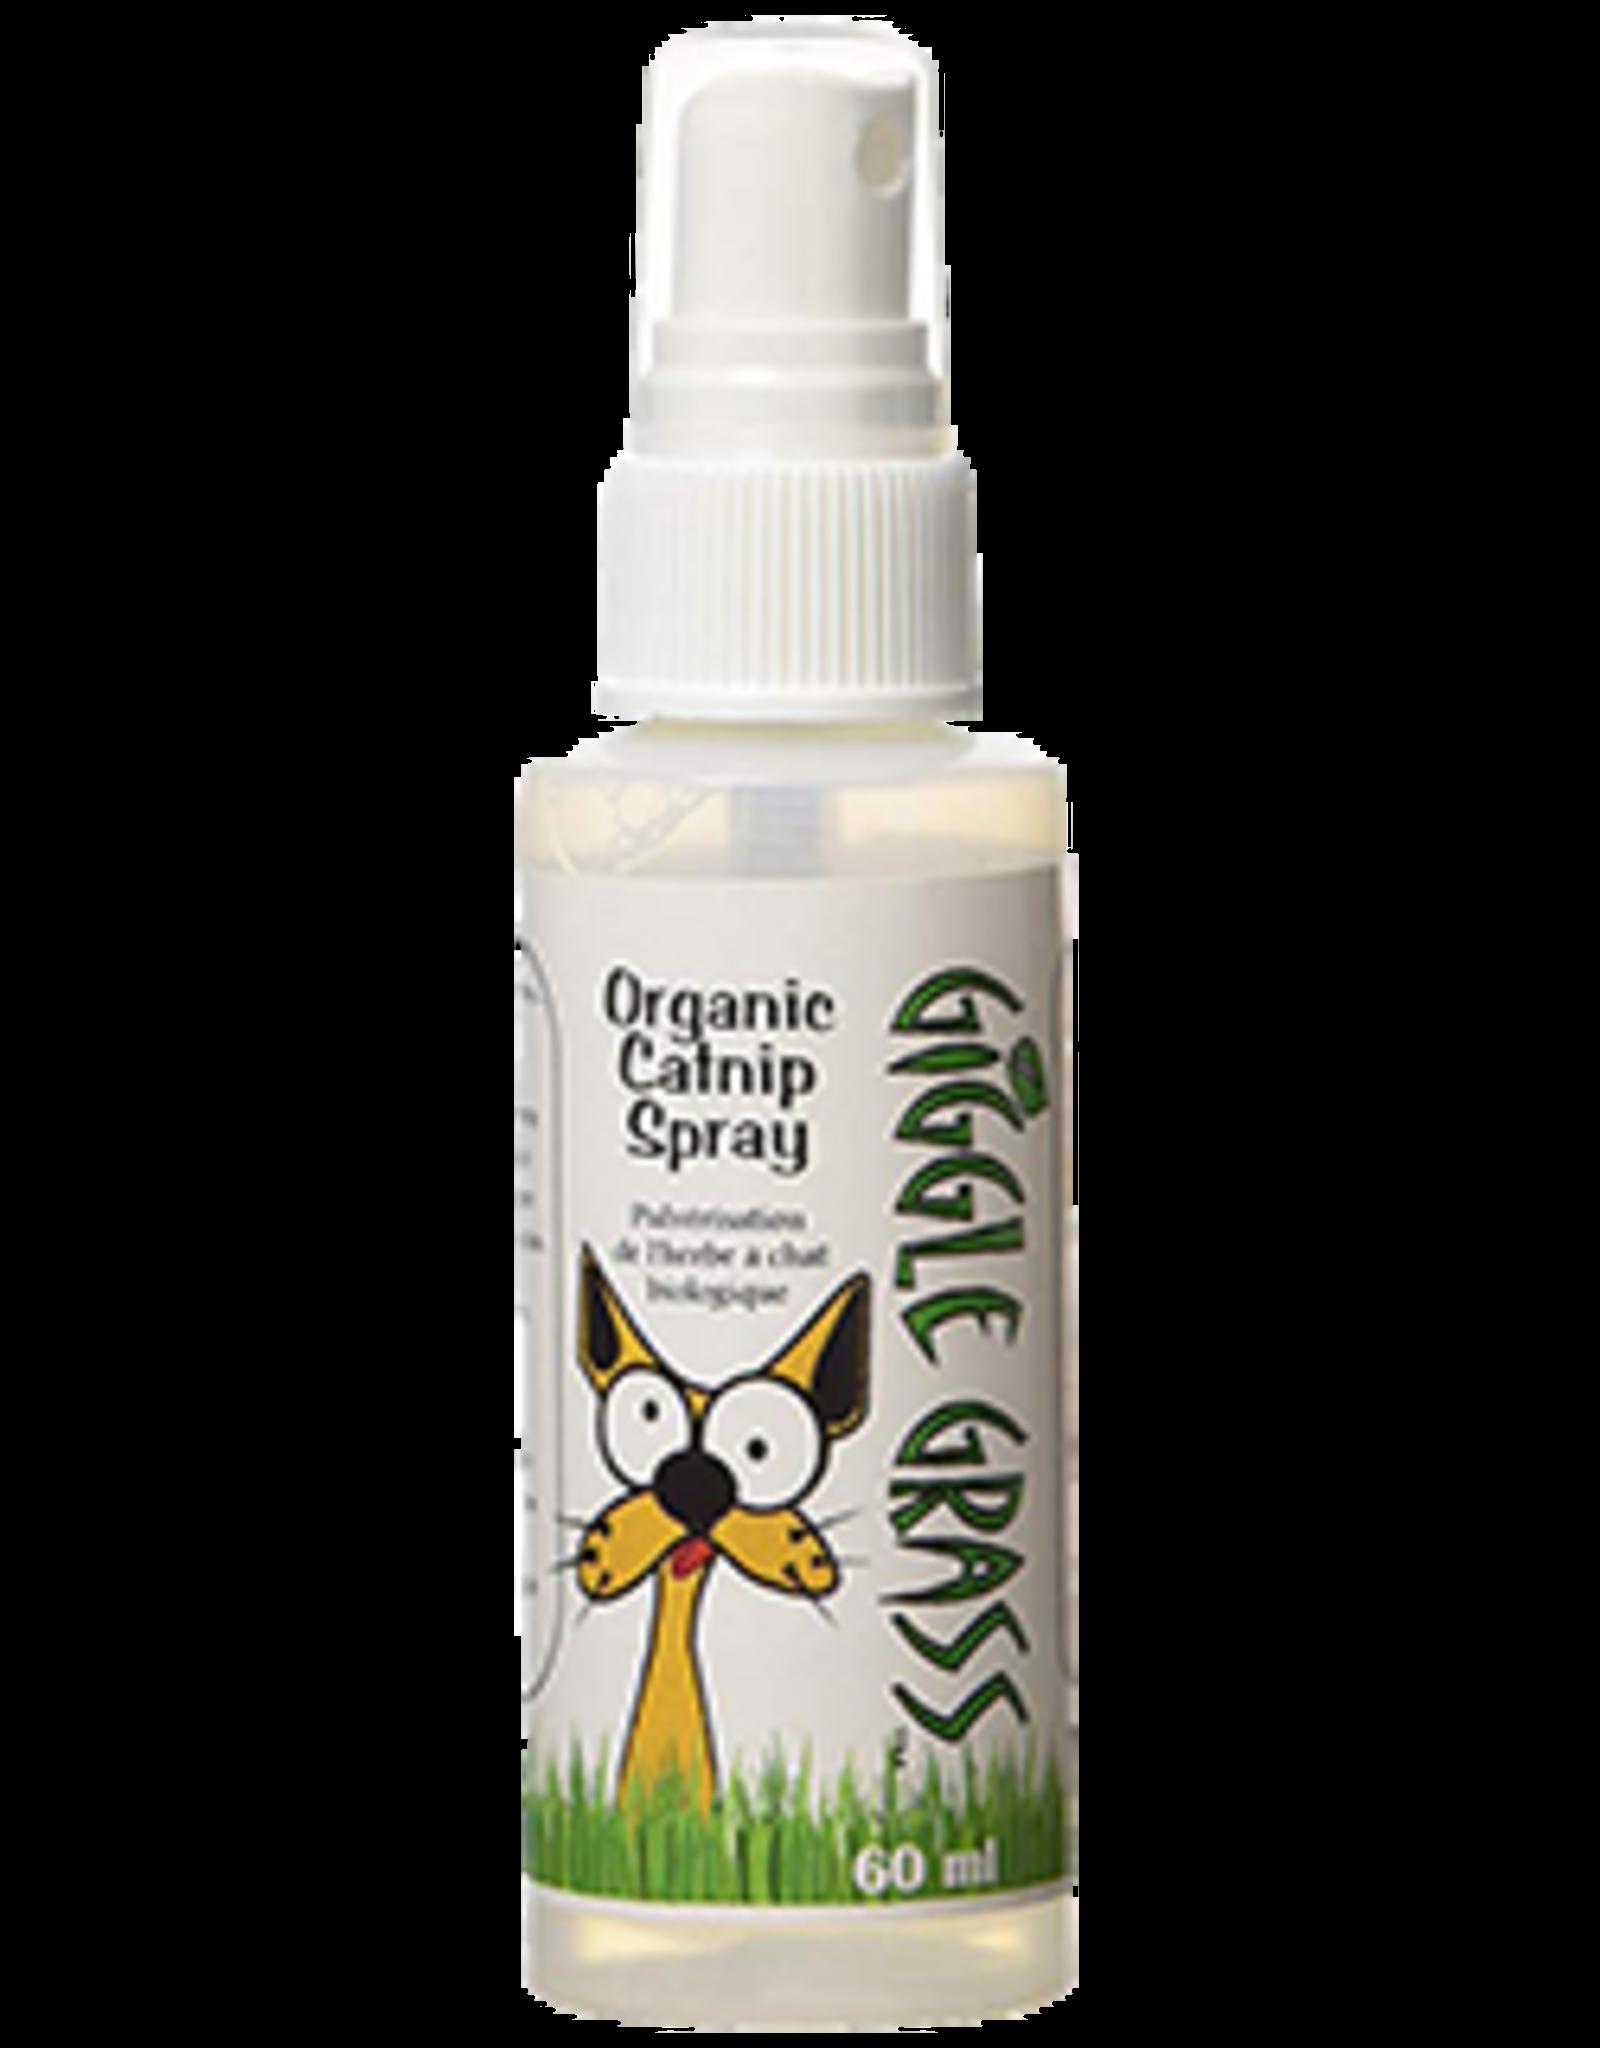 Giggle Grass Giggle Grass Catnip Spray 60ml